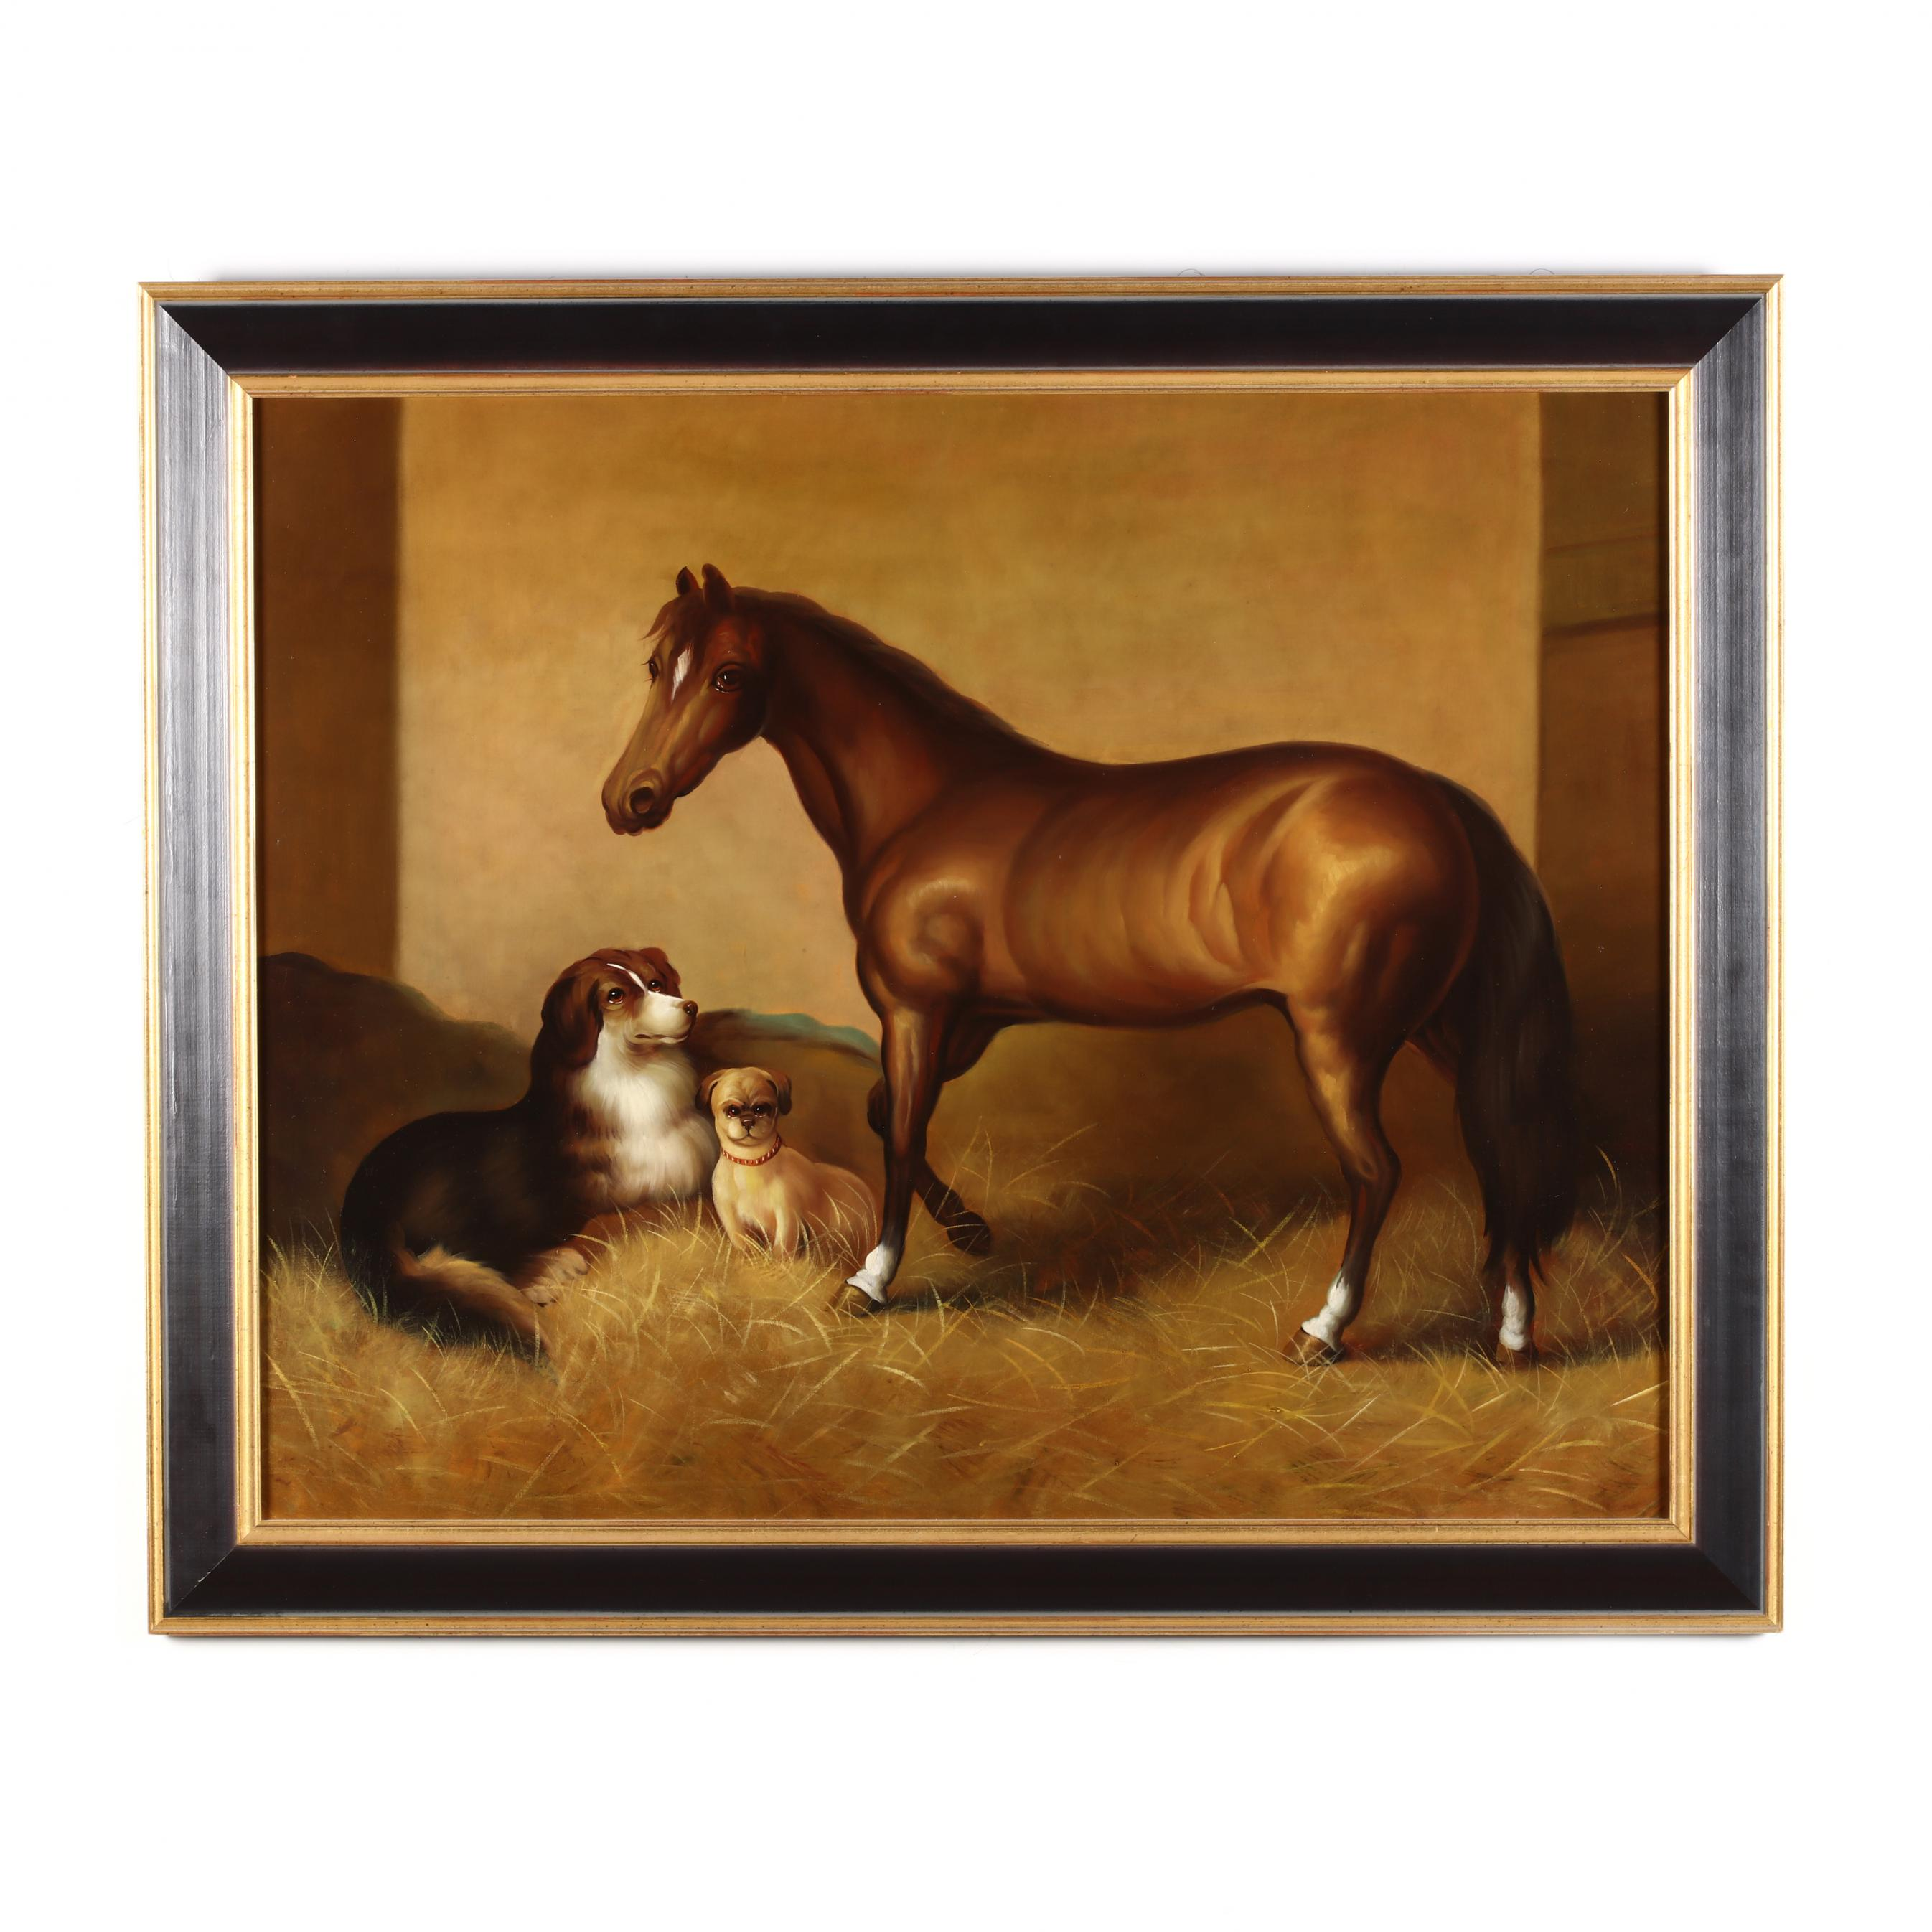 a-chelsea-house-painting-after-emma-landseer-british-1809-1895